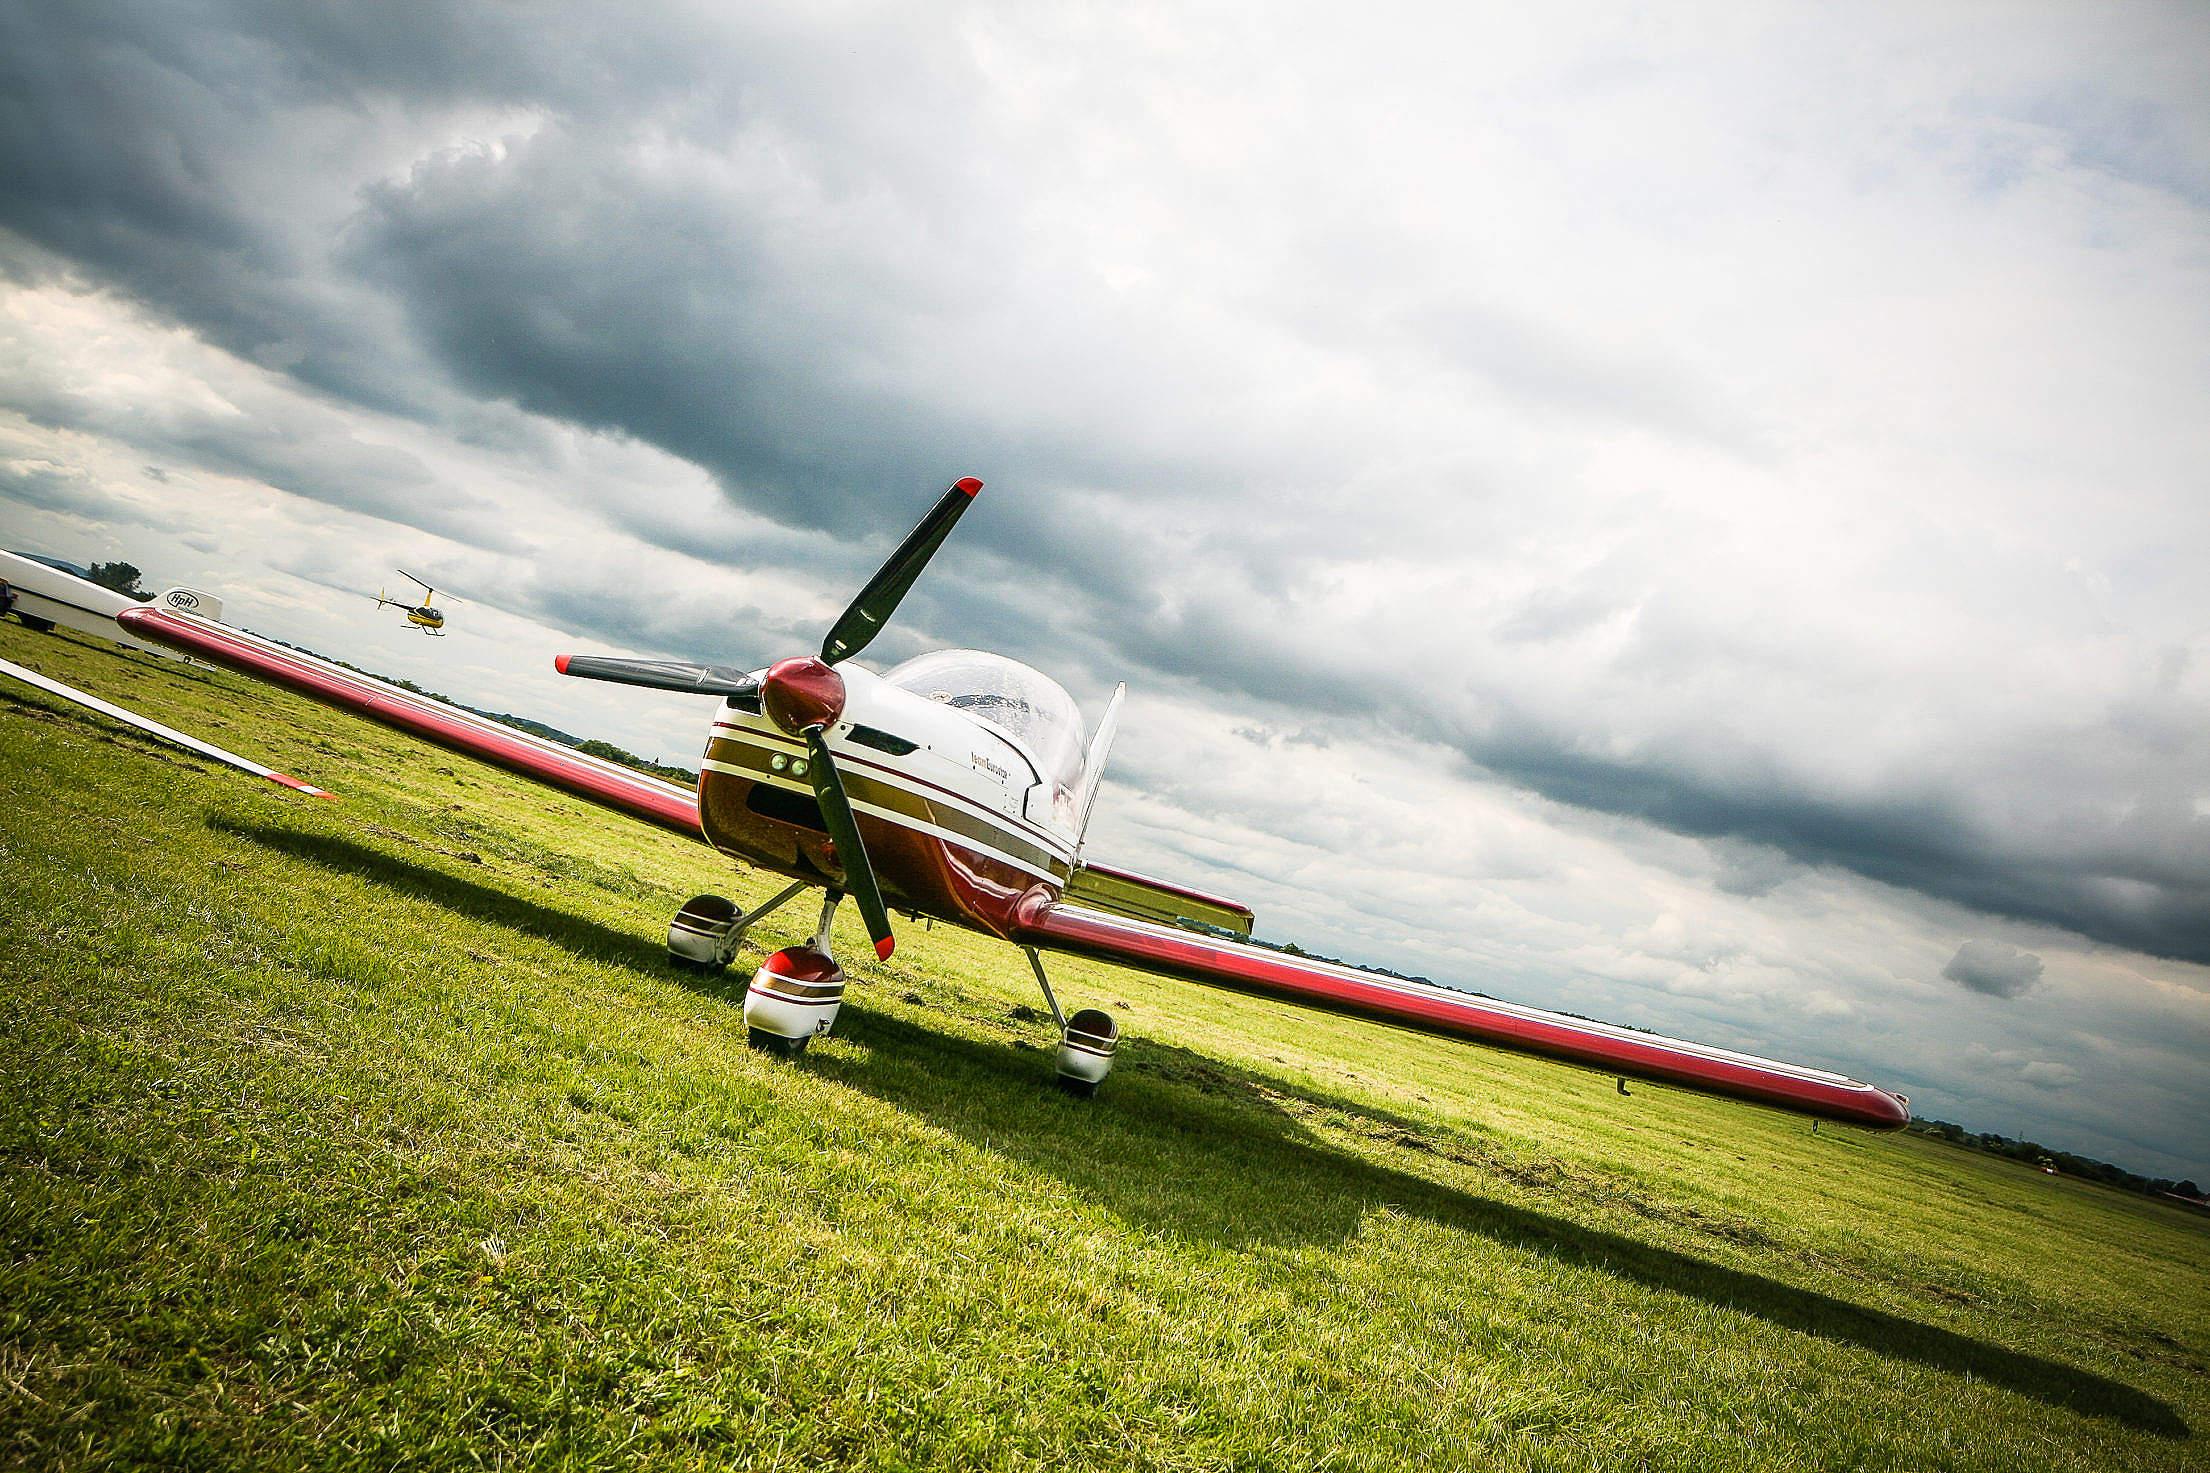 Red Airplane Free Stock Photo